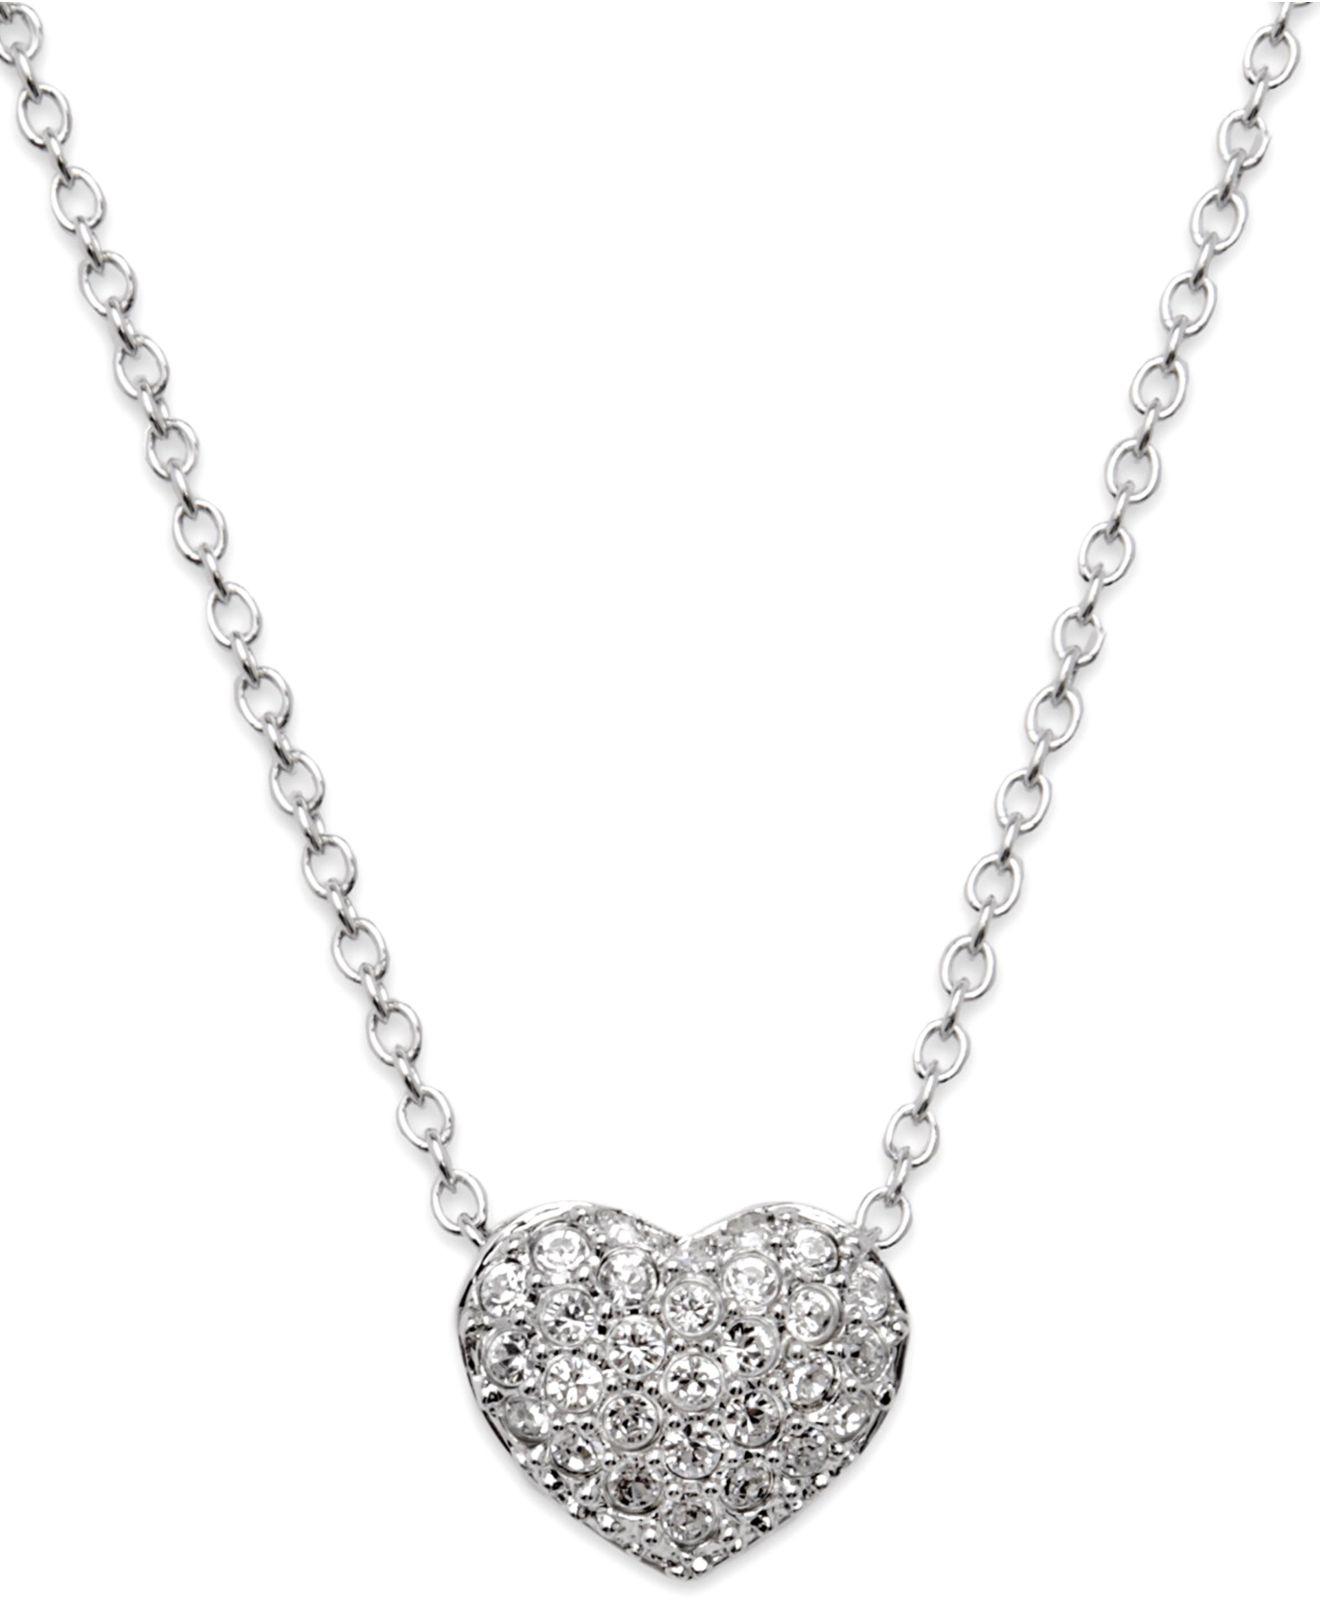 Heart swarovski necklace : Swarovski necklace crystal heart pendant in silver lyst